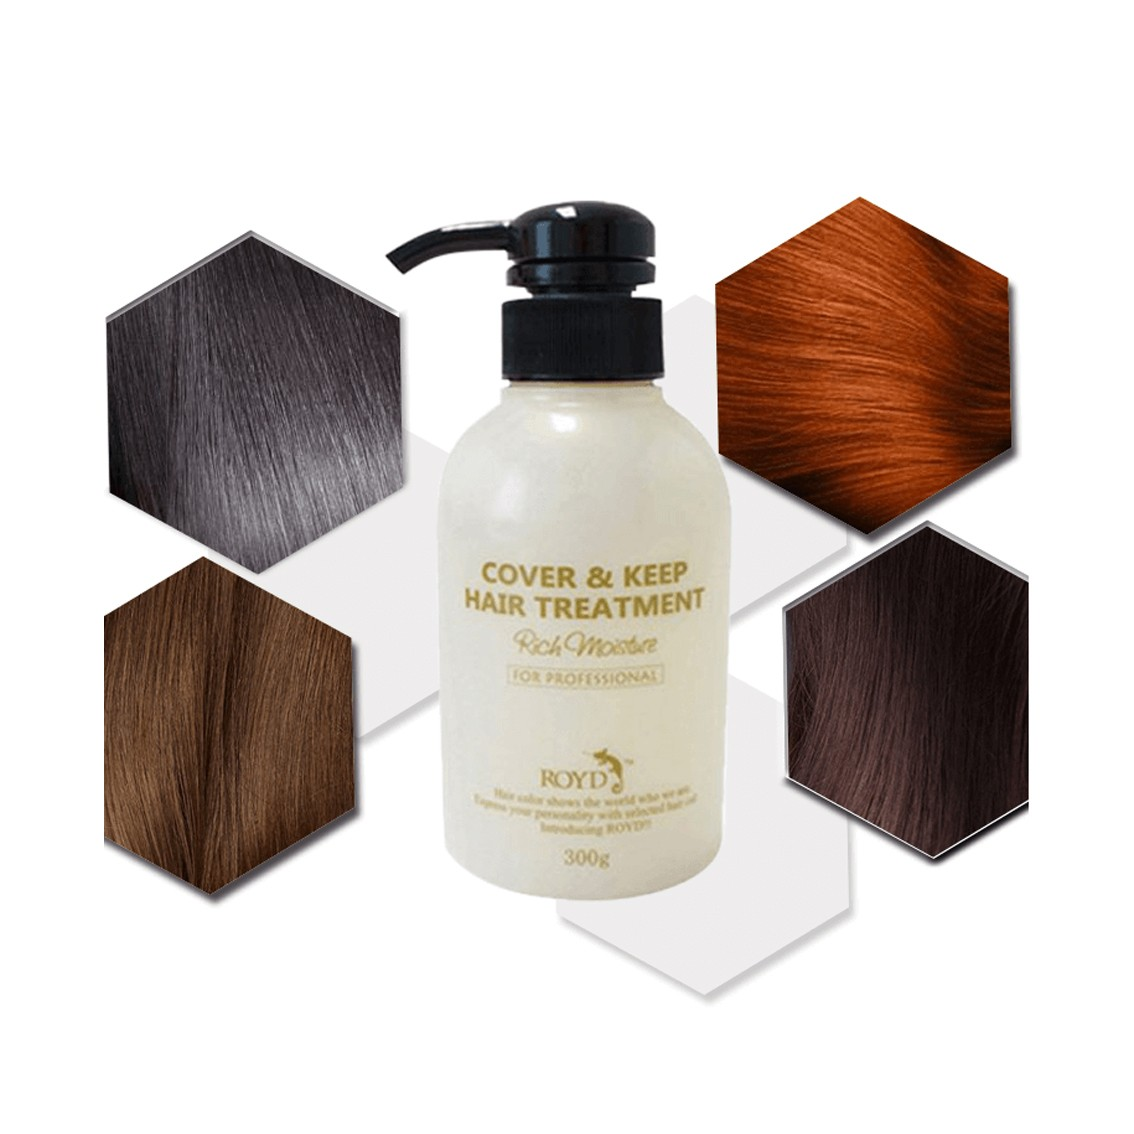 ROYD Hair Treatment